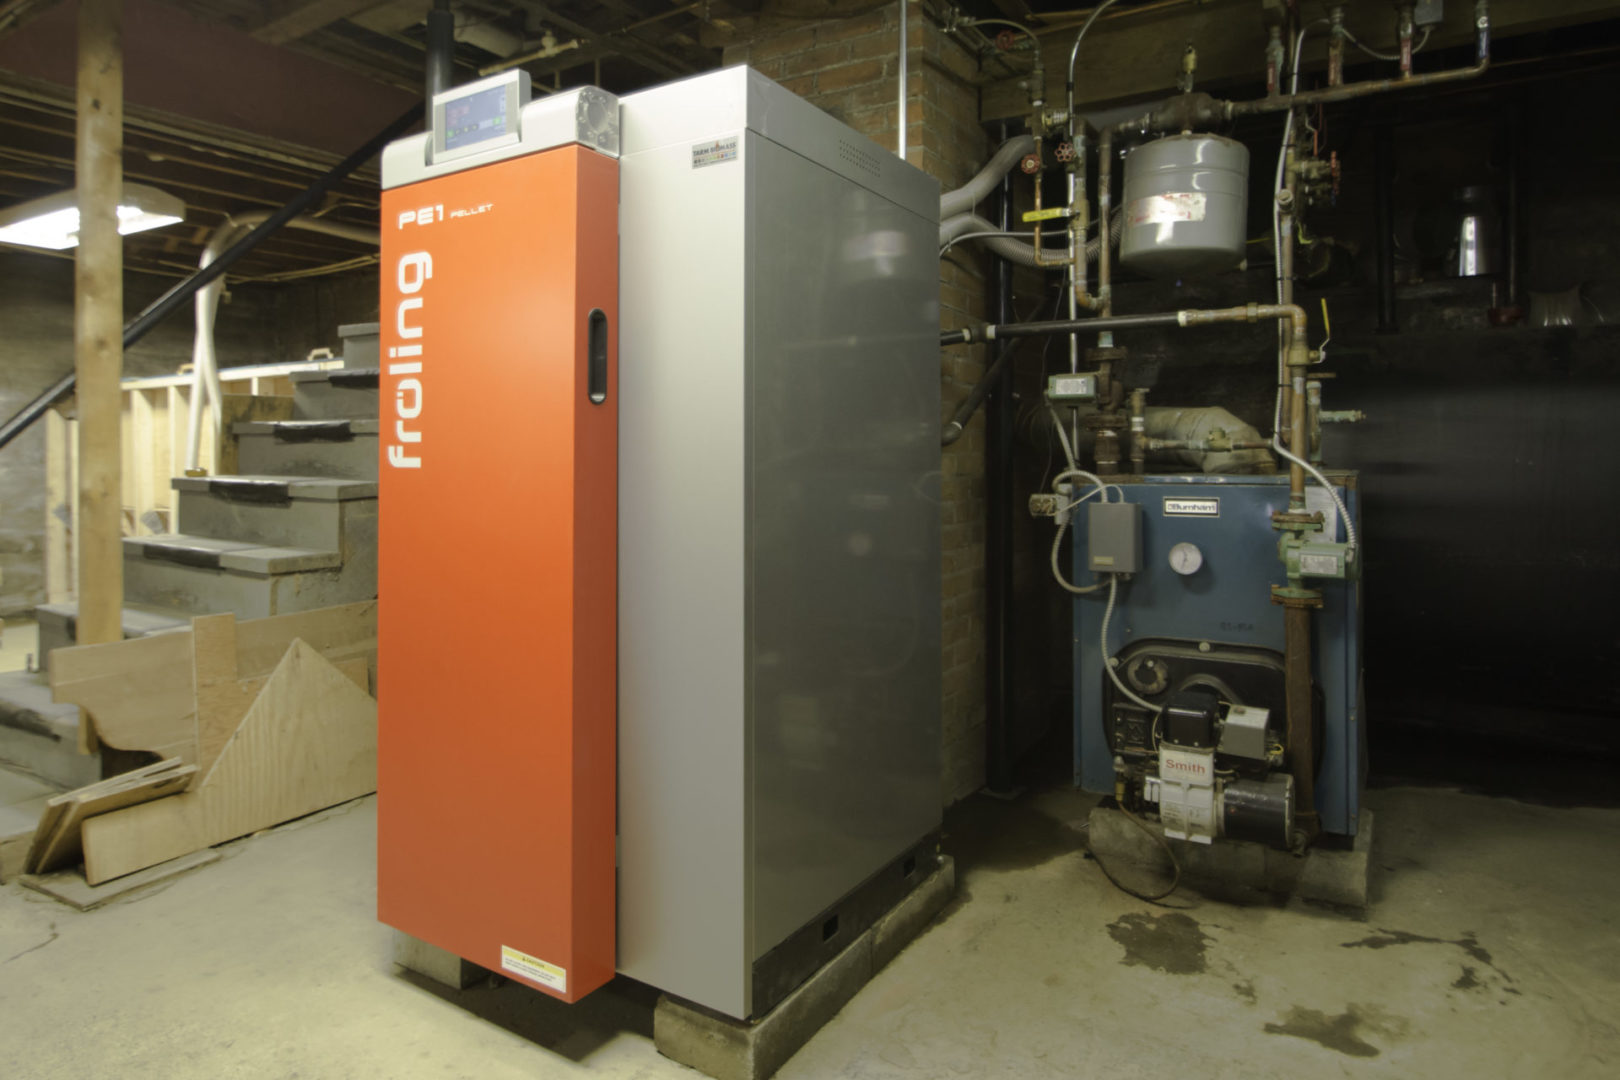 Fröling Pe1 wood pellet boiler